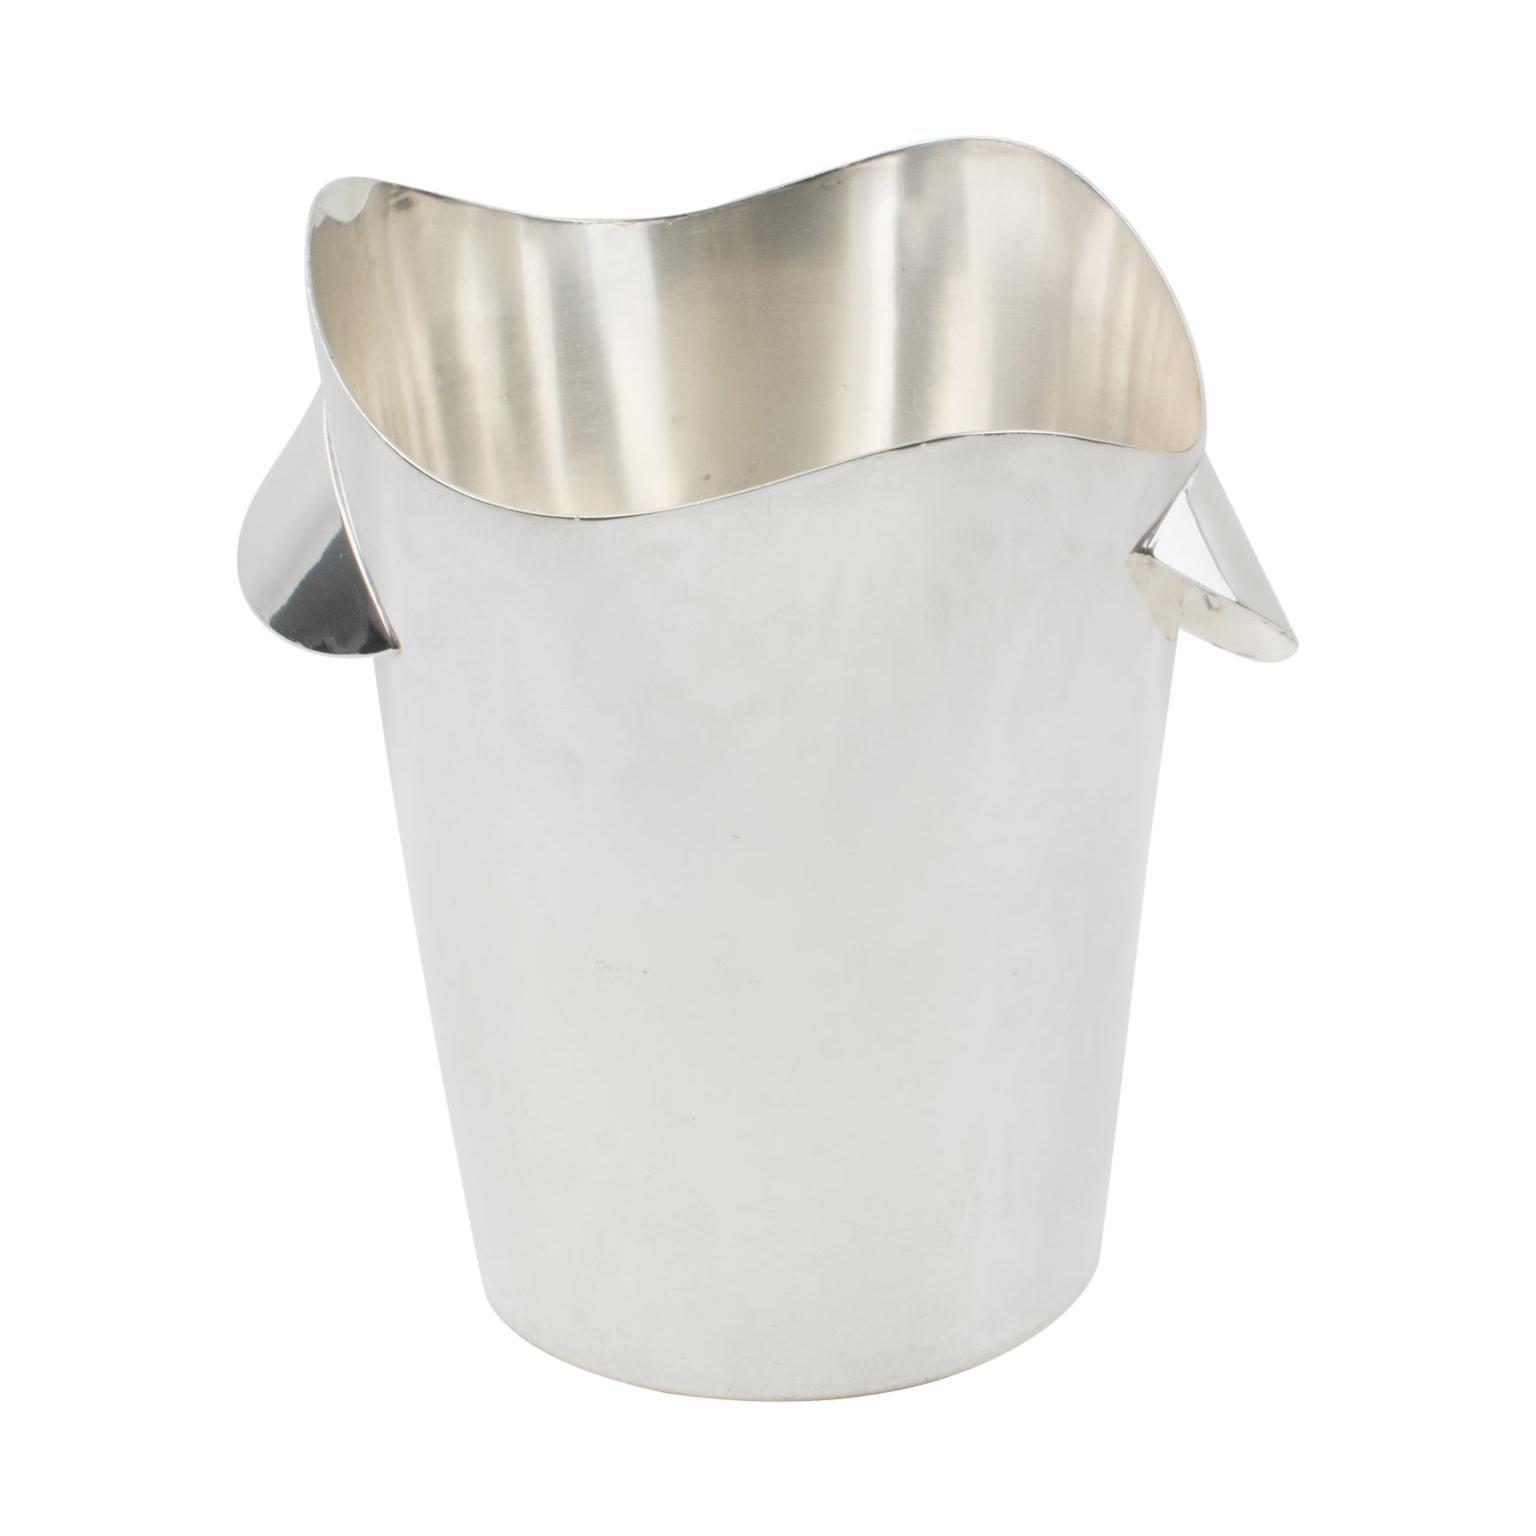 Modernist Silver Plate Champagne Ice Bucket Wine Cooler by Wiskemann